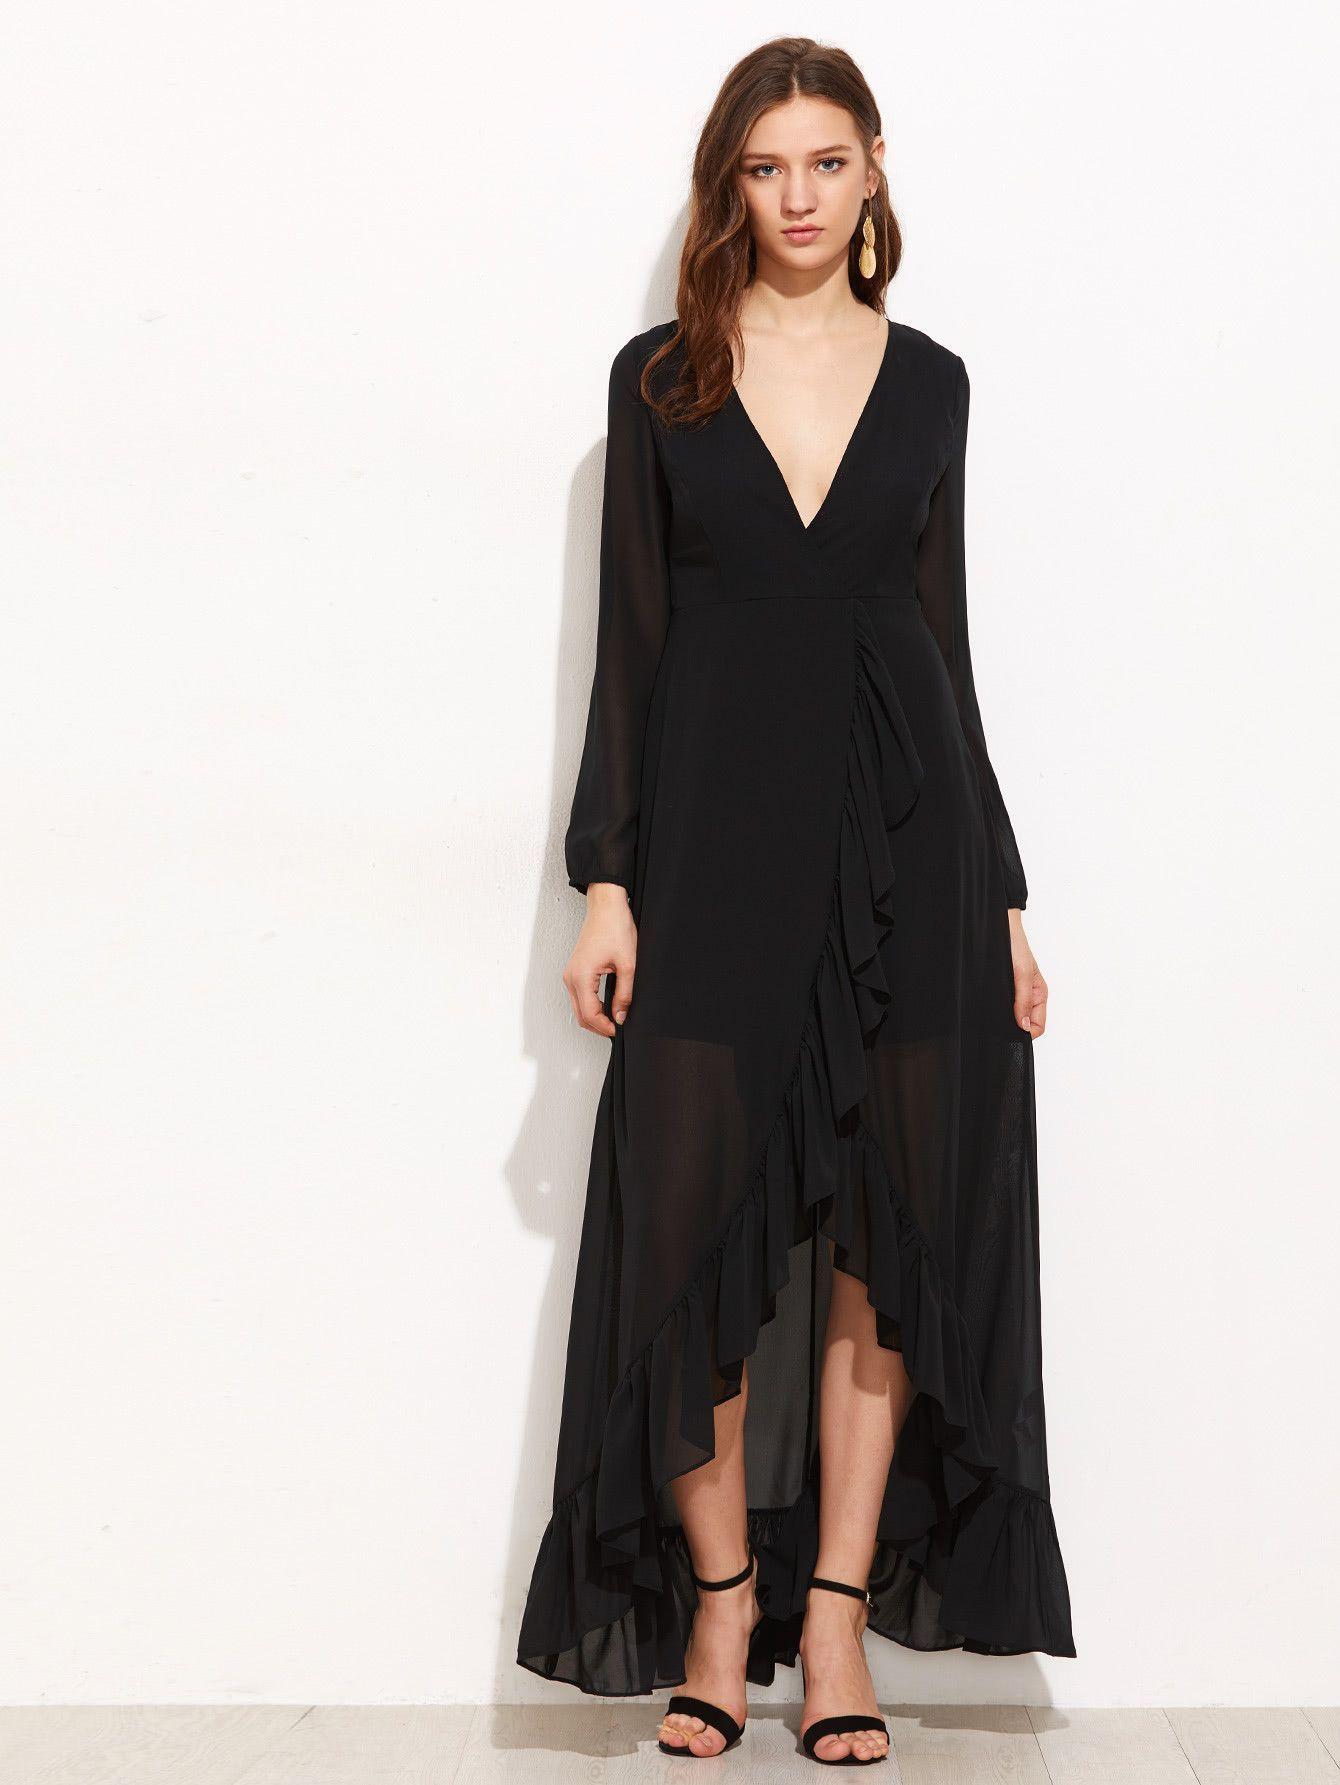 1b0489fa7b0 Black Deep V-Neck Lantern Sleeve Frill Trim Surplice Wrap Maxi Dress ...